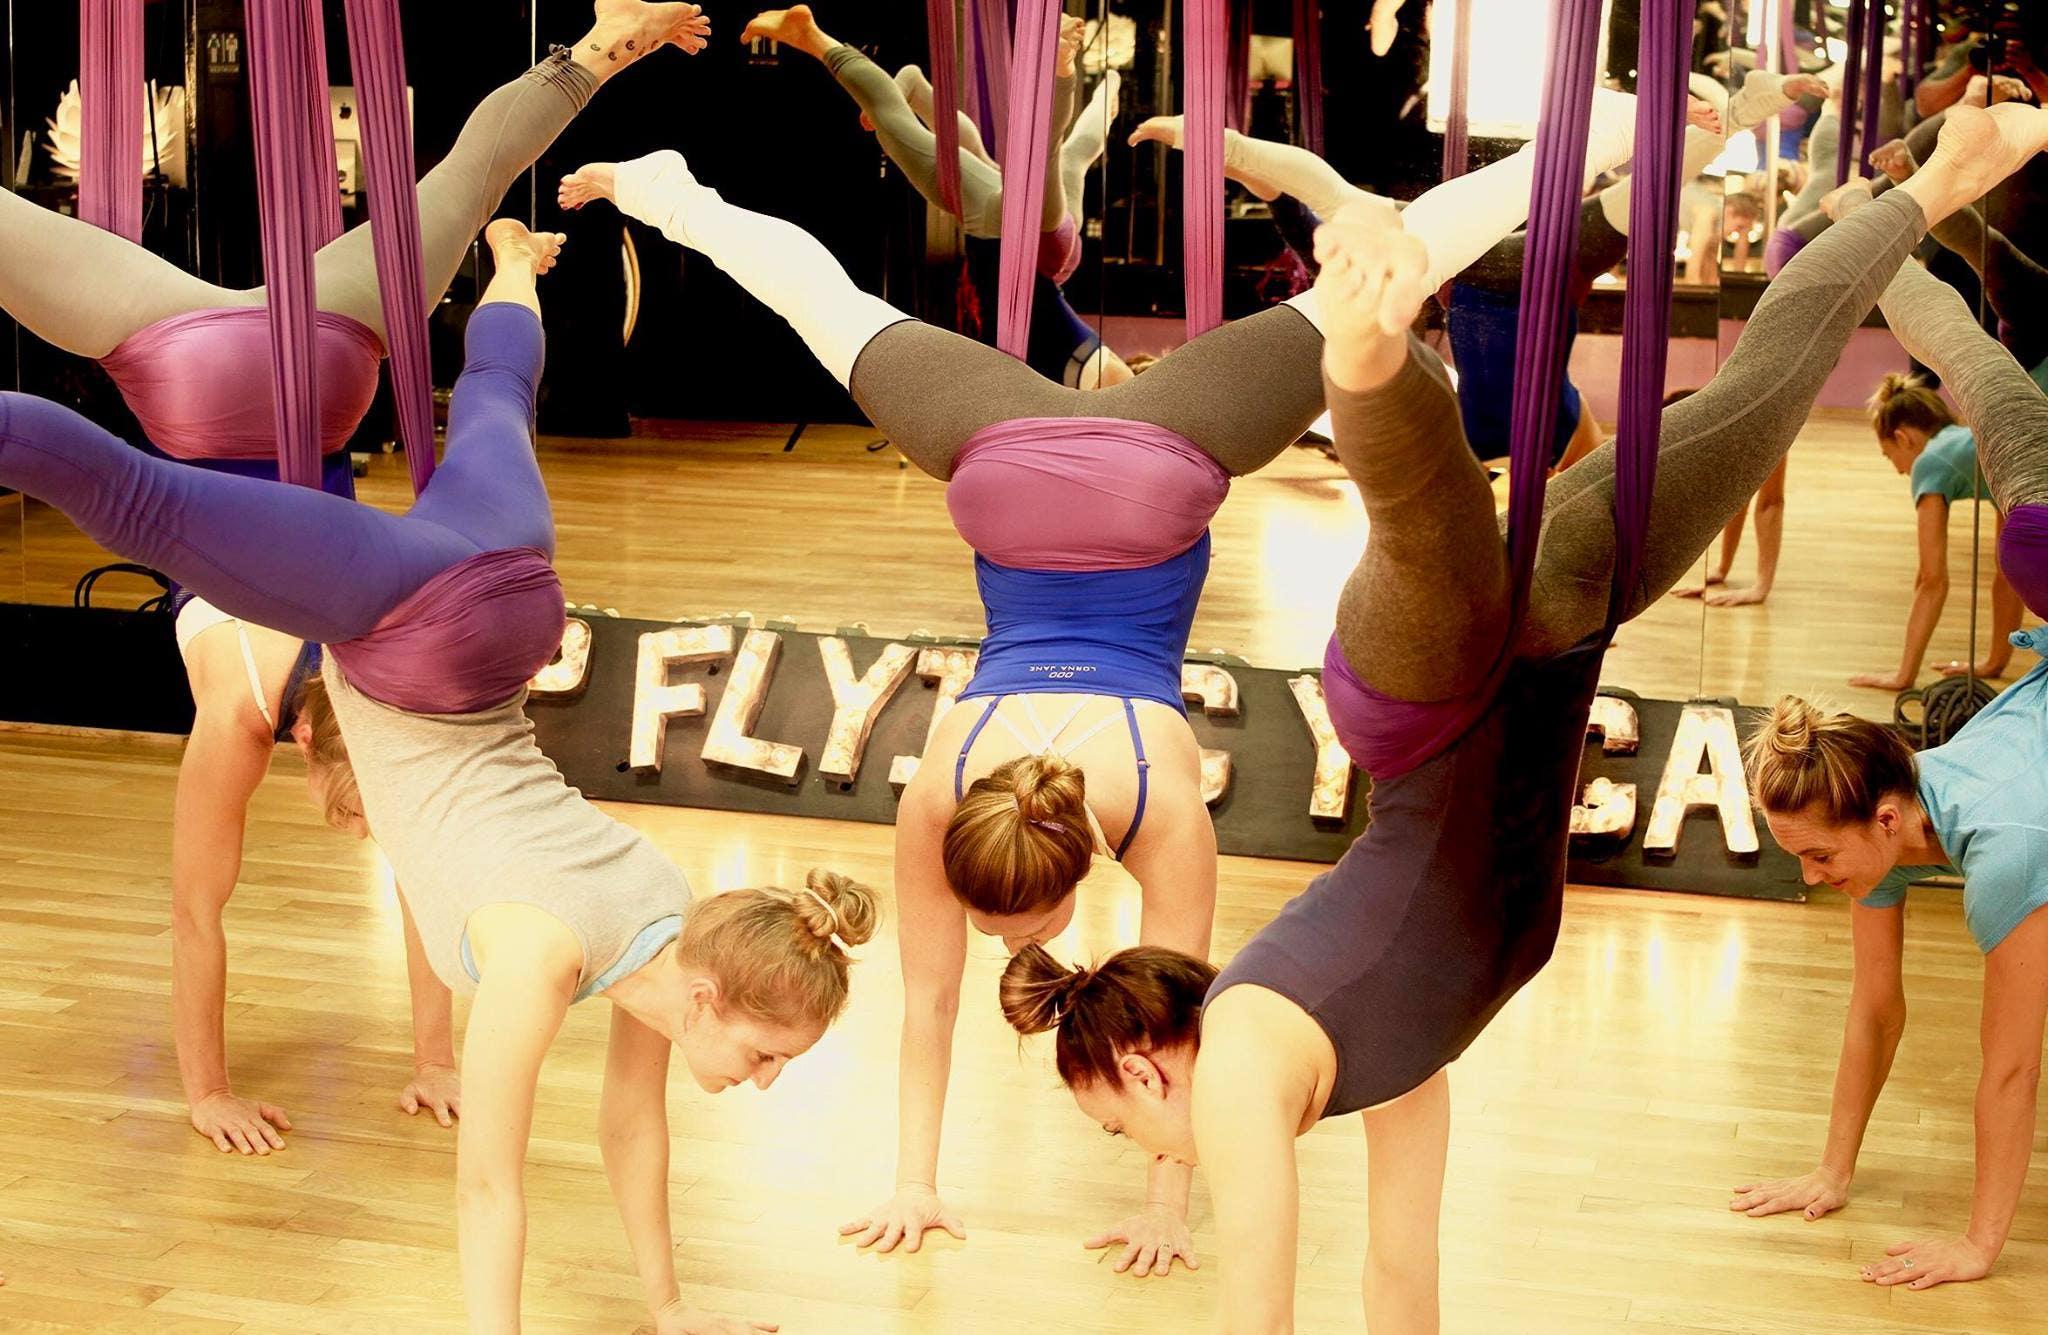 Up Flying Yoga in Studio City